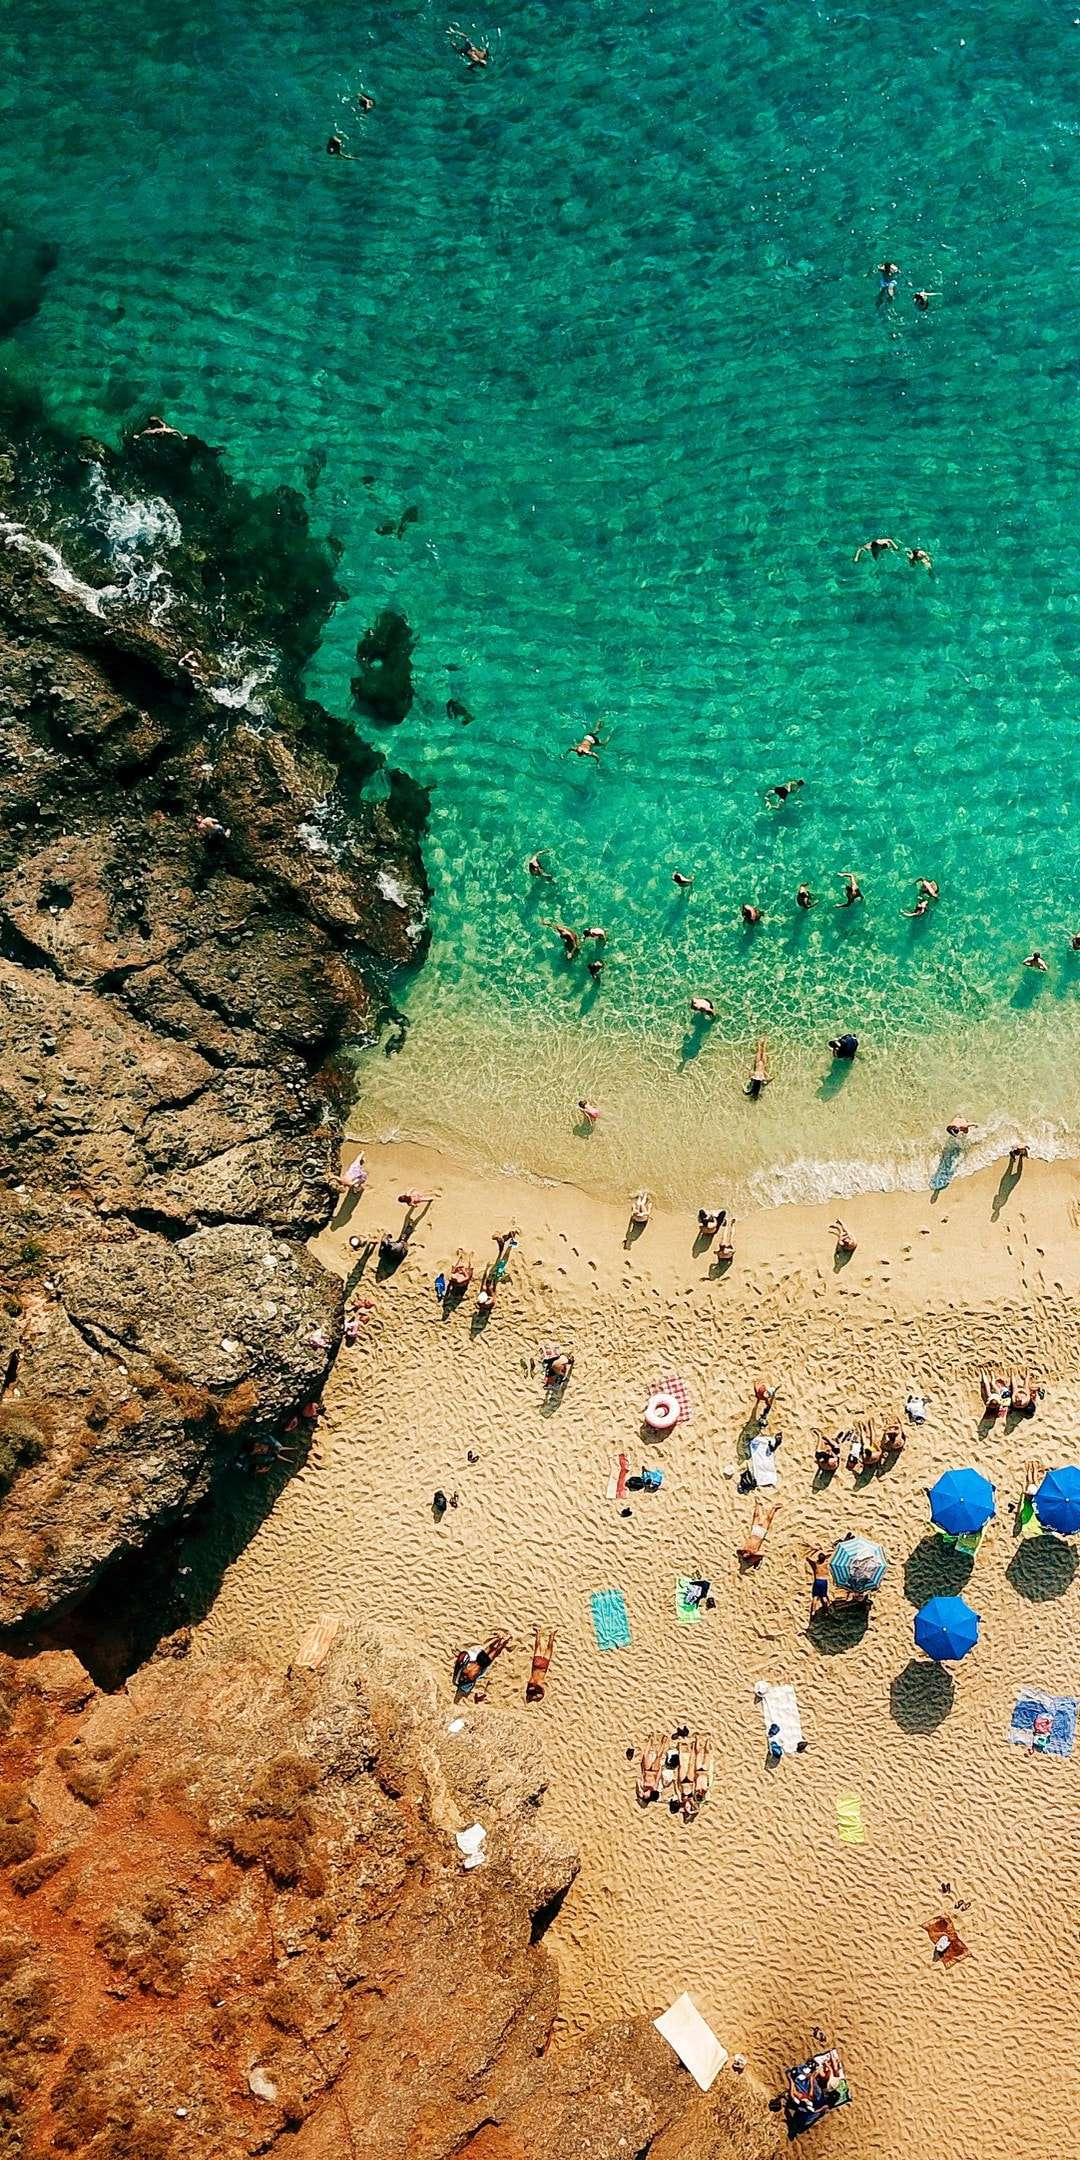 Beach People Aerial View iPhone Wallpaper